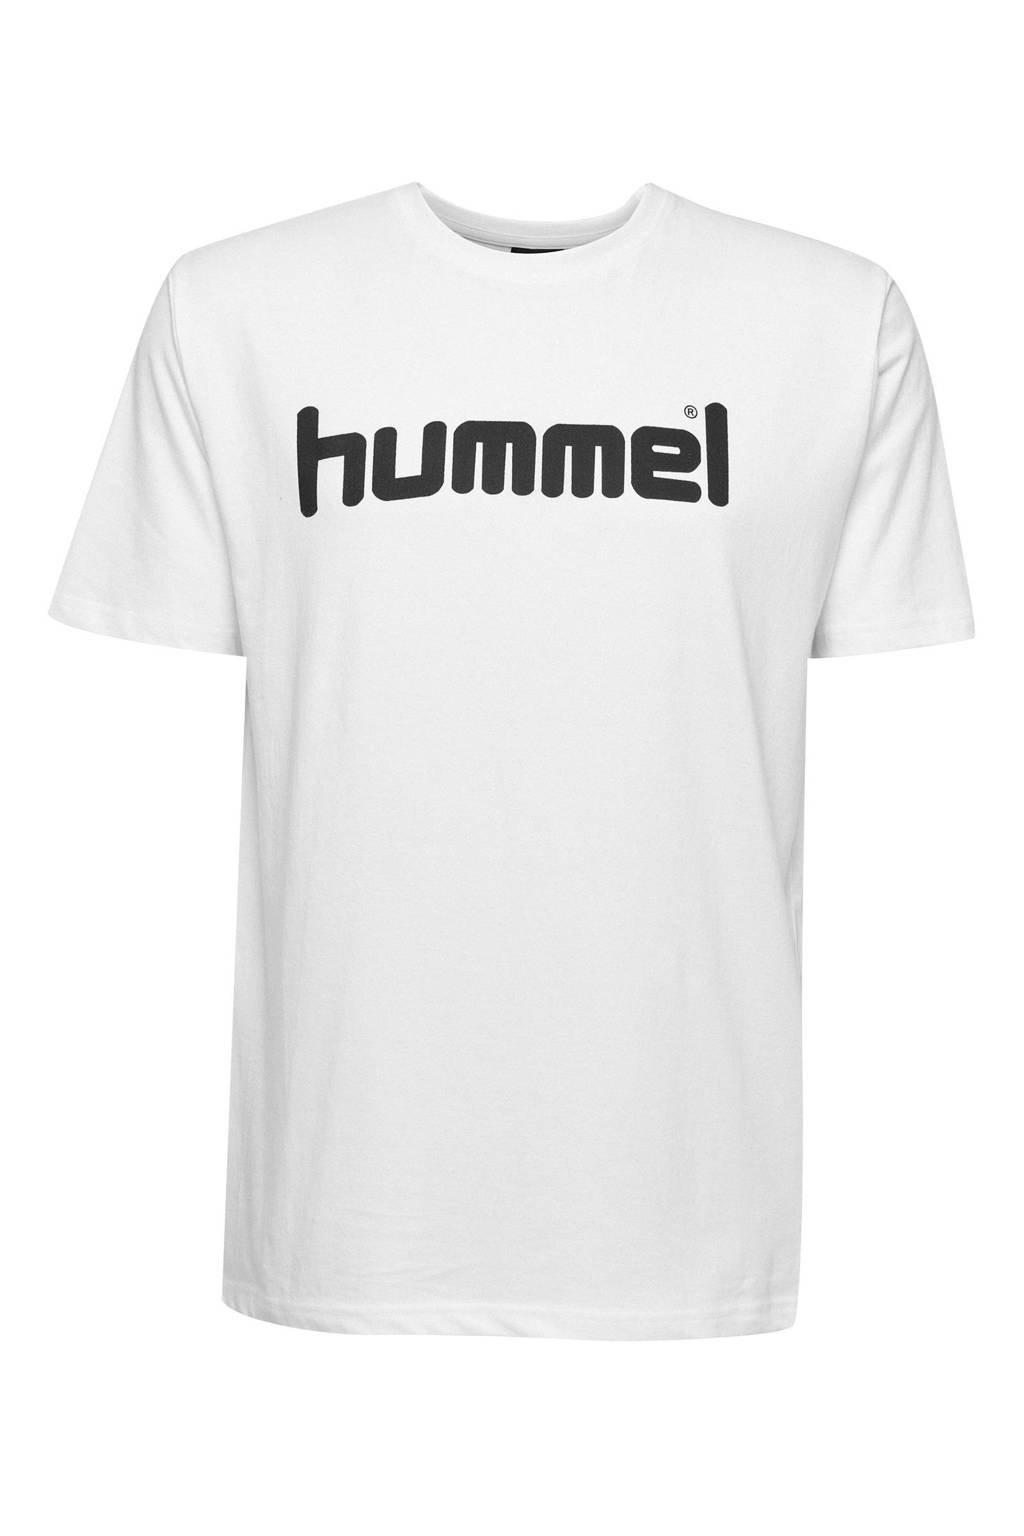 hummel   T-shirt wit, Wit, Heren